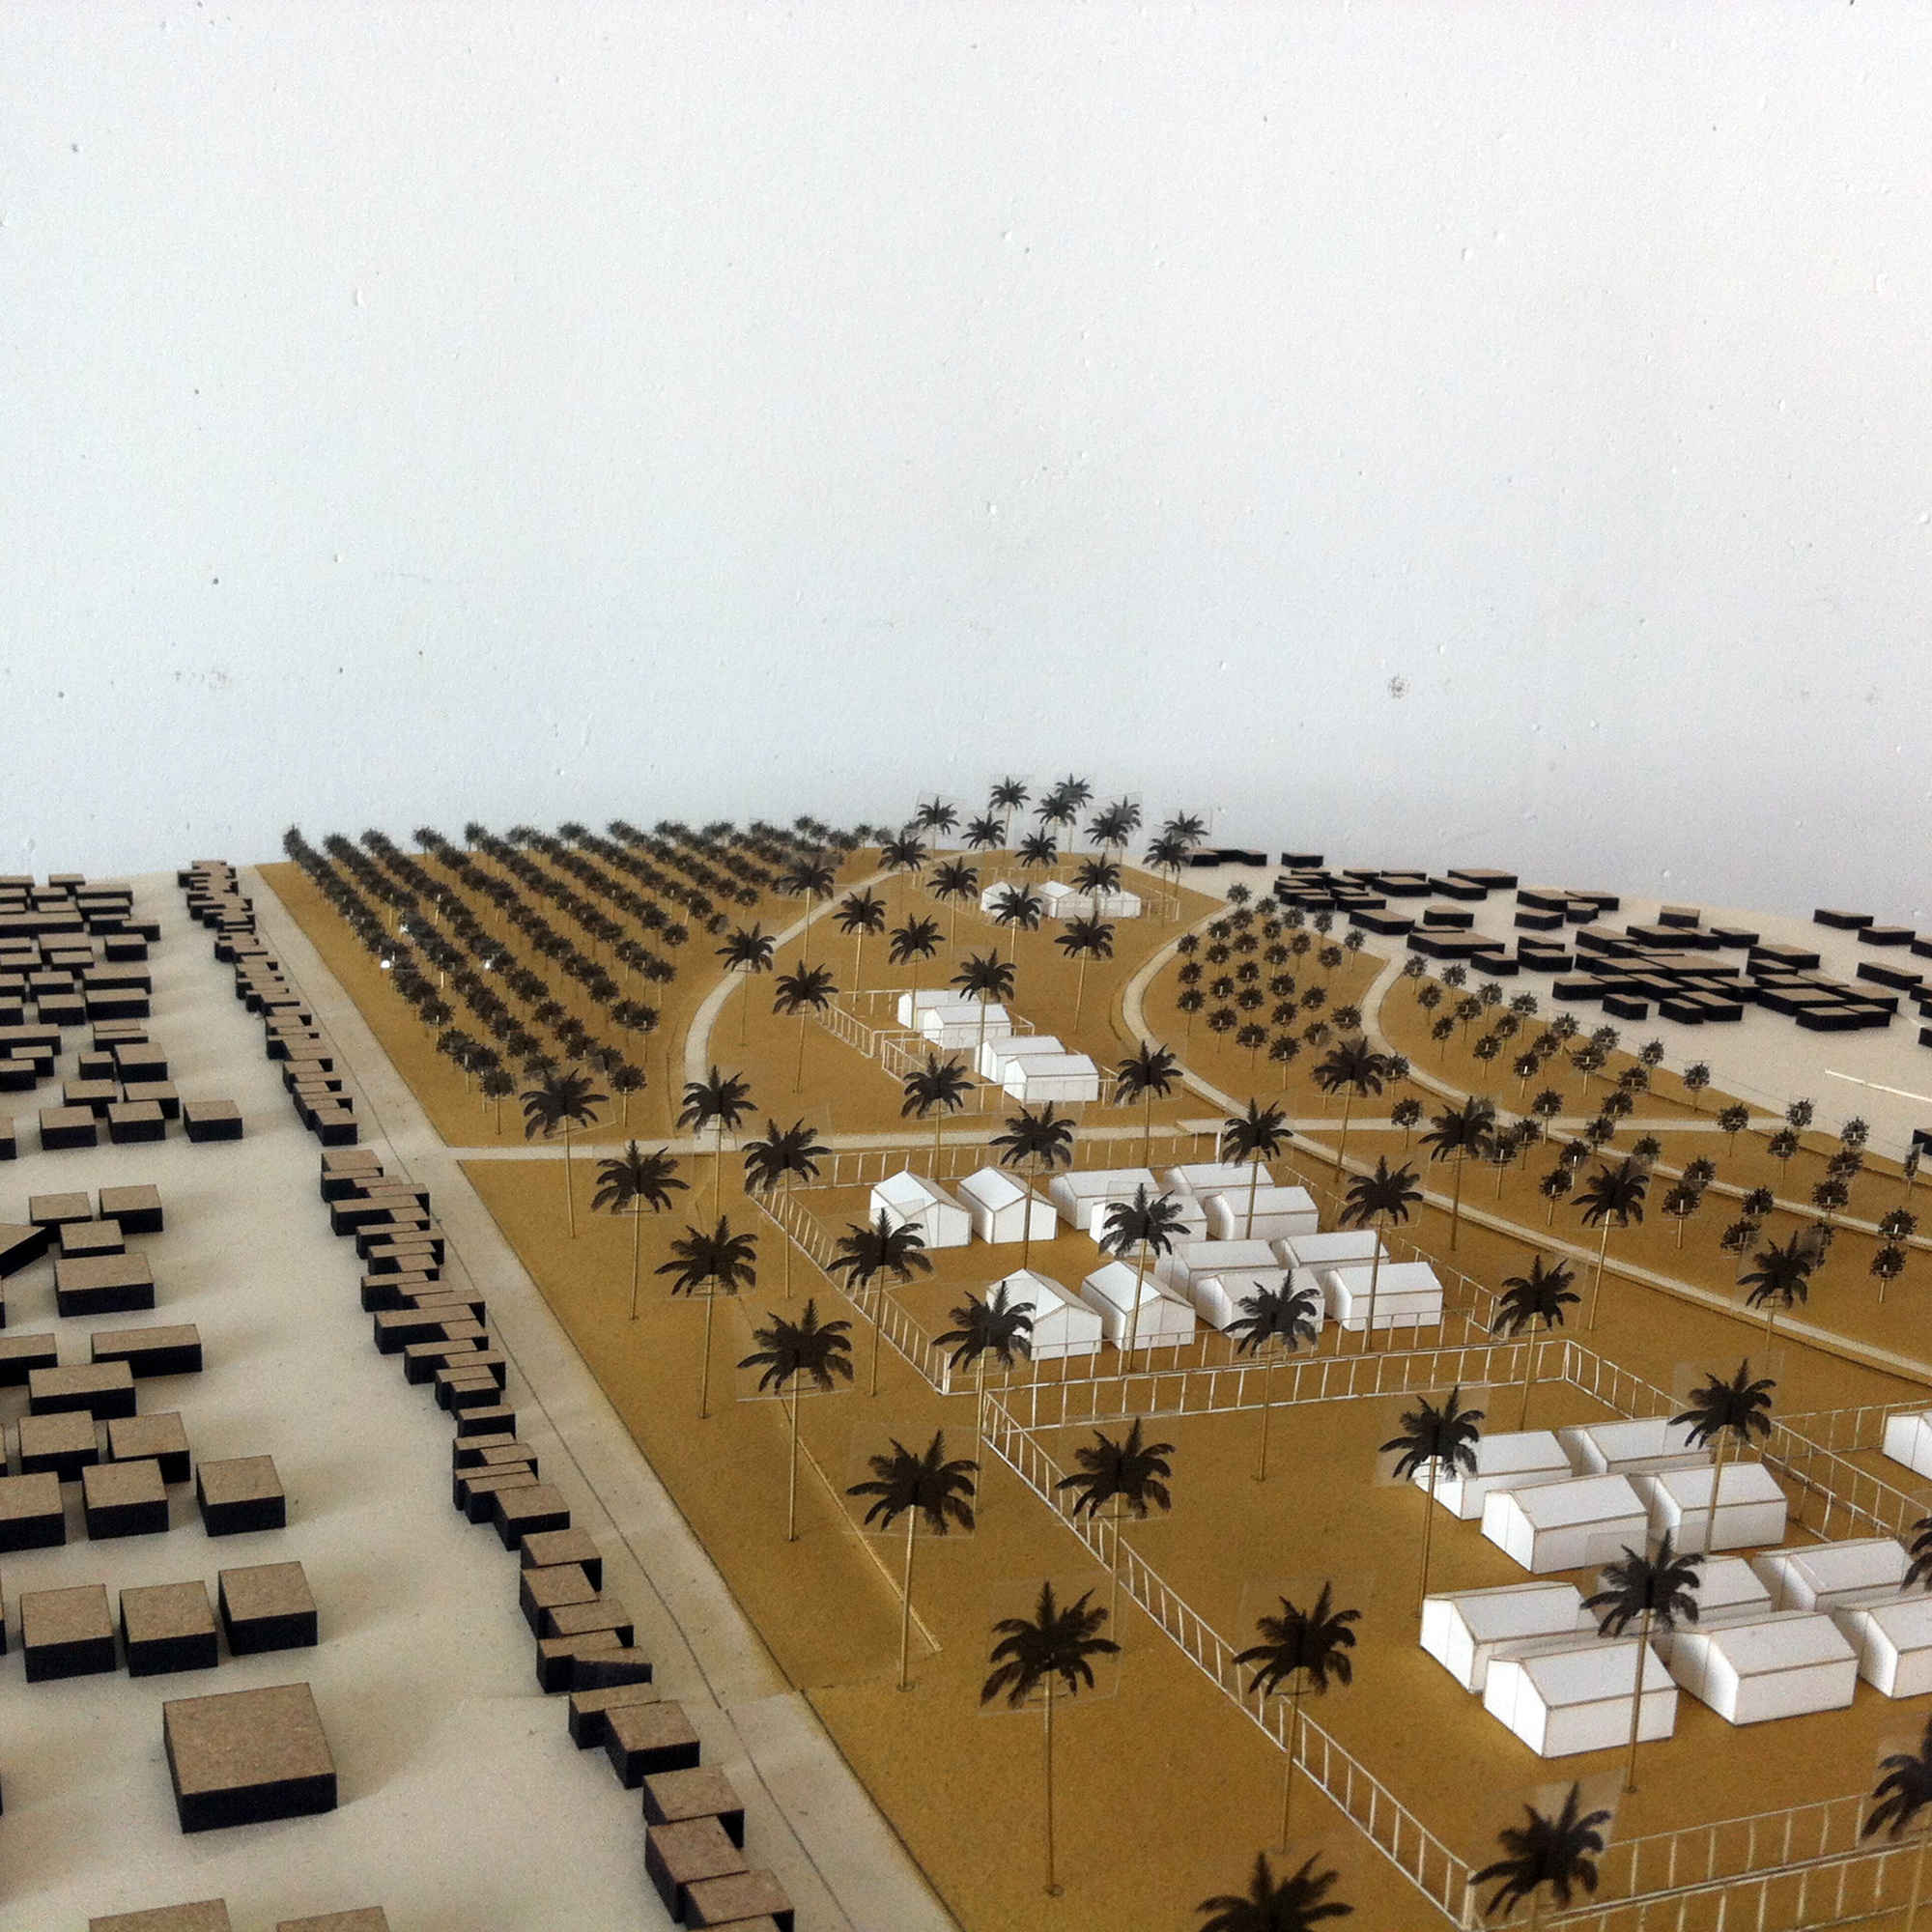 Camps de réfugiés de guerre